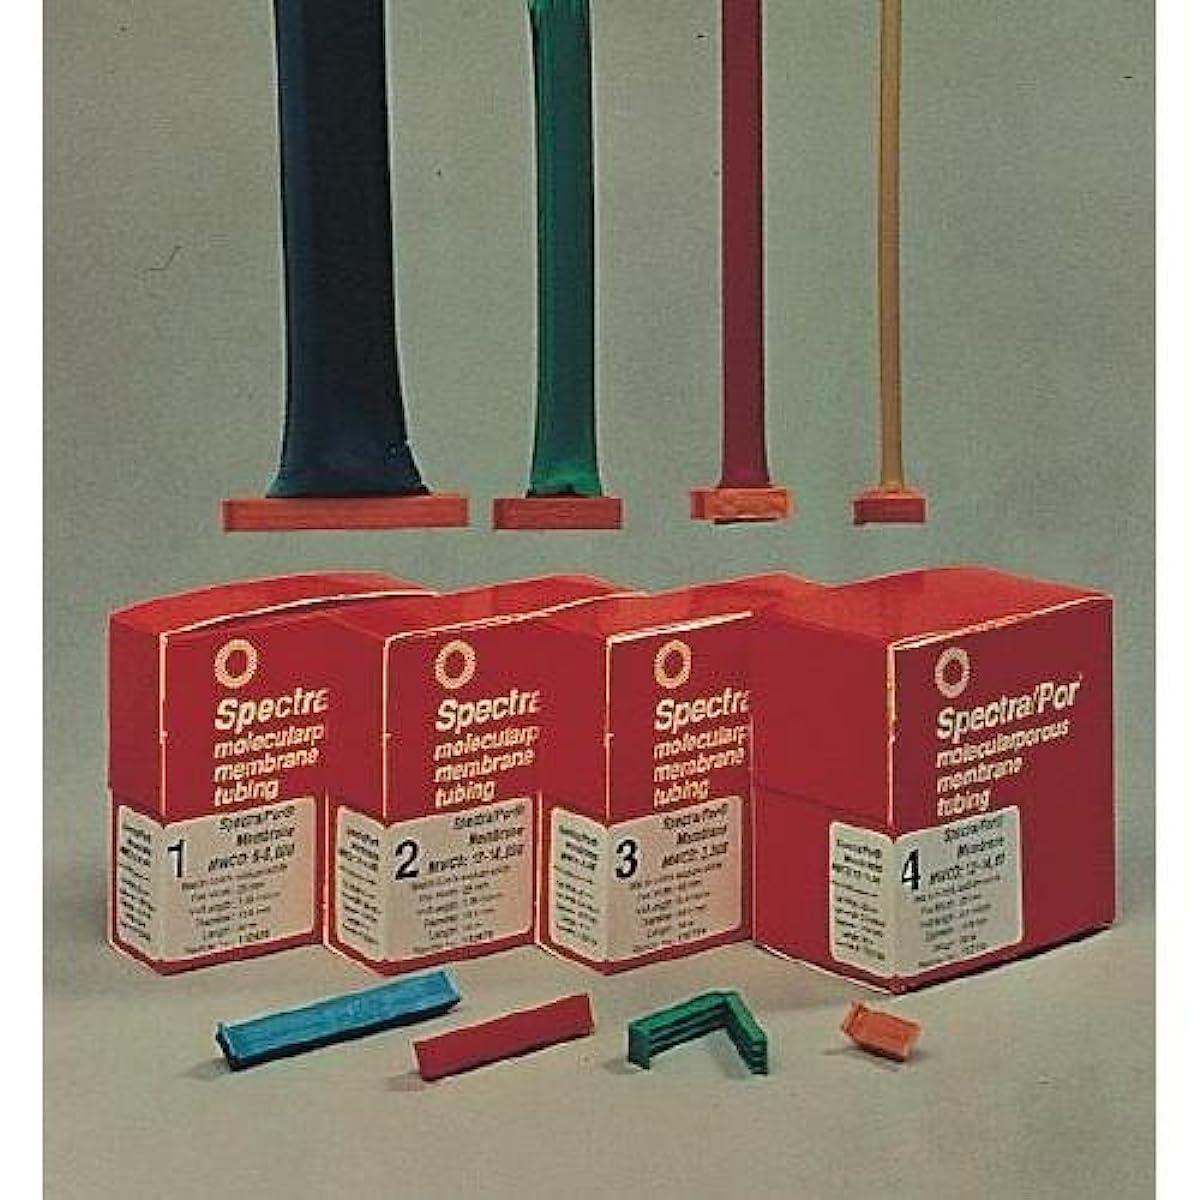 Spectrum 132709 Spectra/Por 4 Dialysis Tubing, 12-14 kD MWCO, 75 mm Flat-Width, 48 mm Diameter